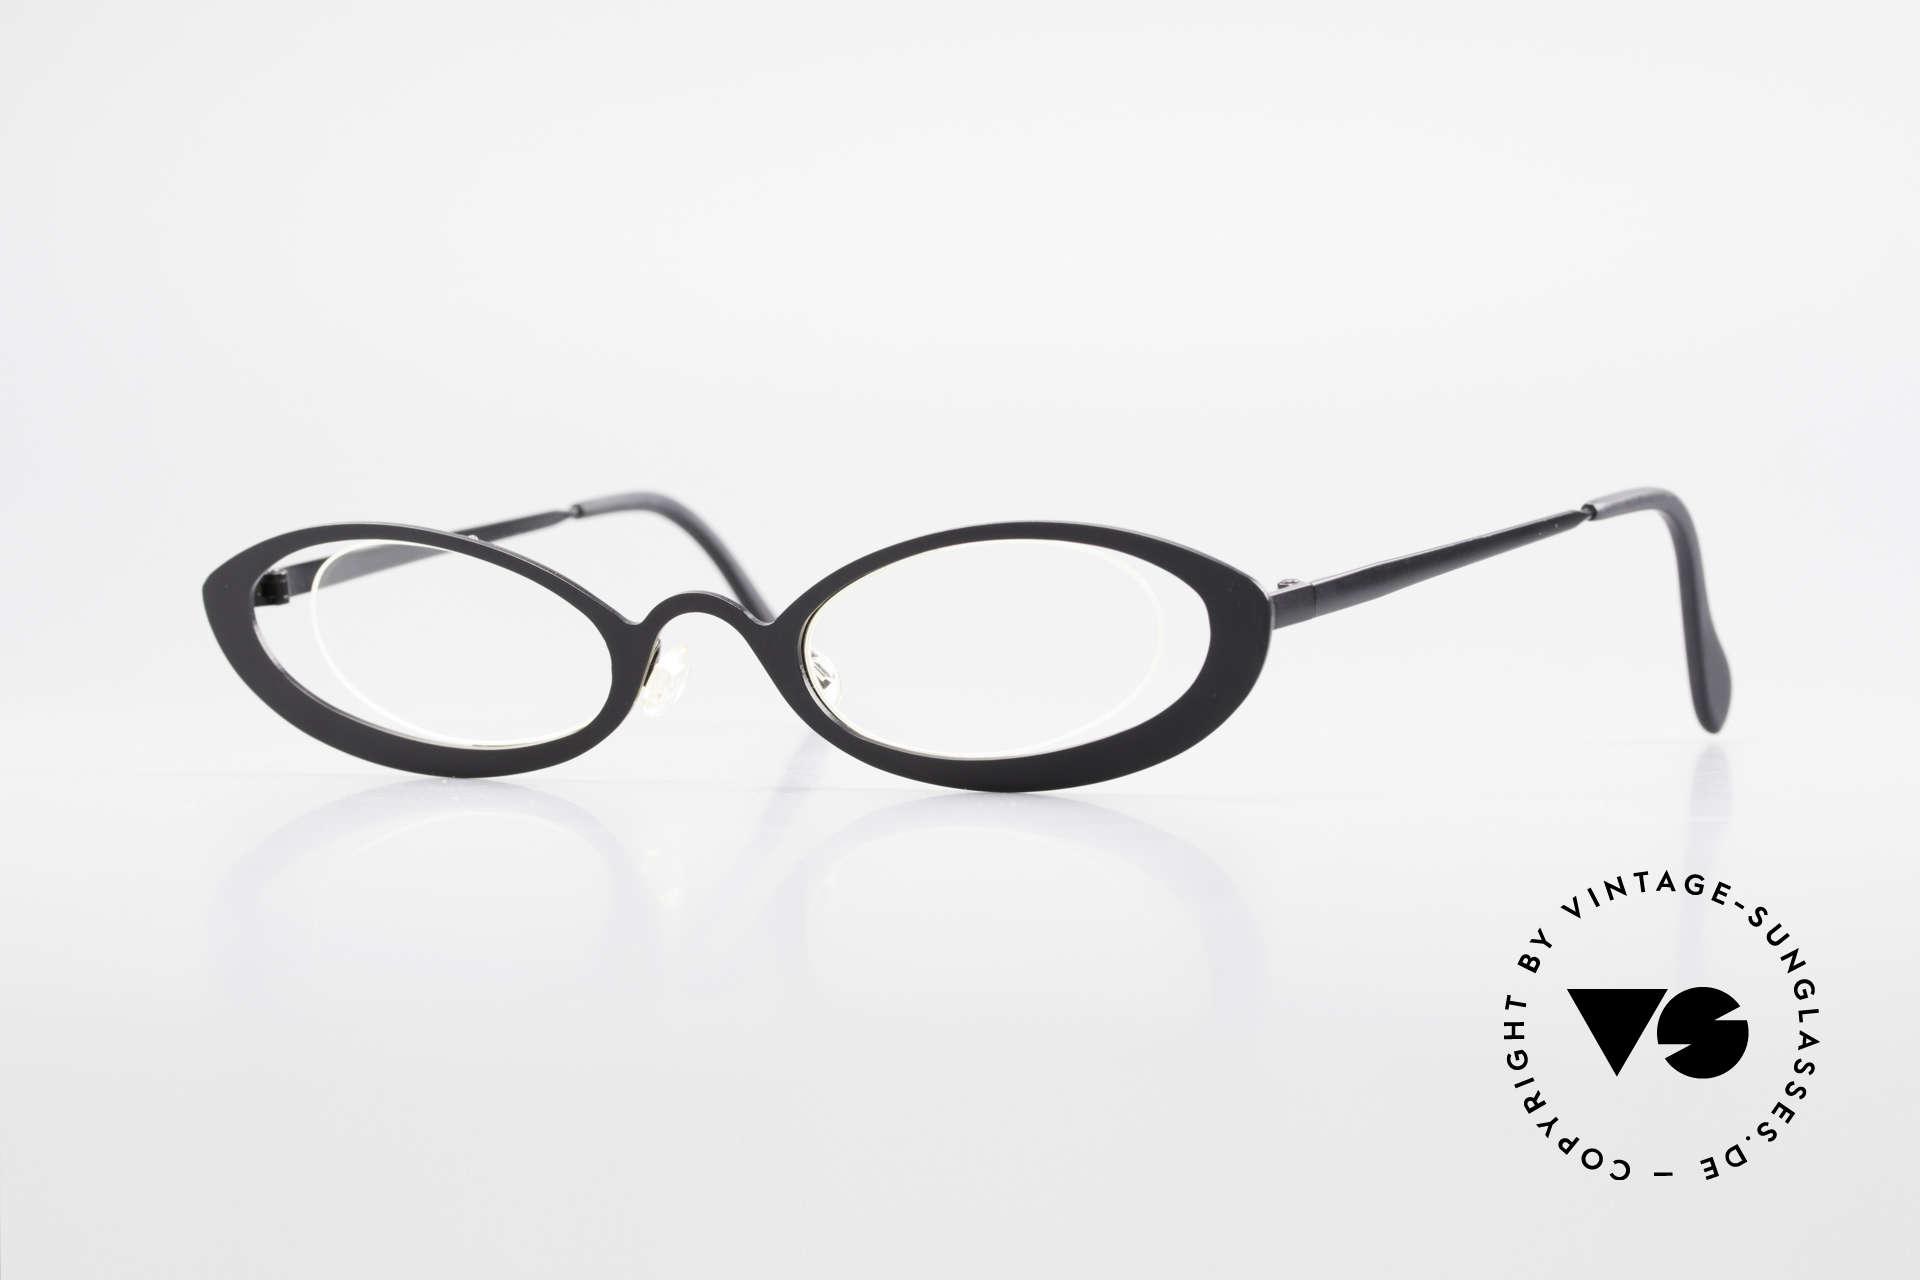 Theo Belgium RaRa Rimless 90's Cateye Glasses, vintage THEO Belgium eyeglass-frame from app. 1997, Made for Women